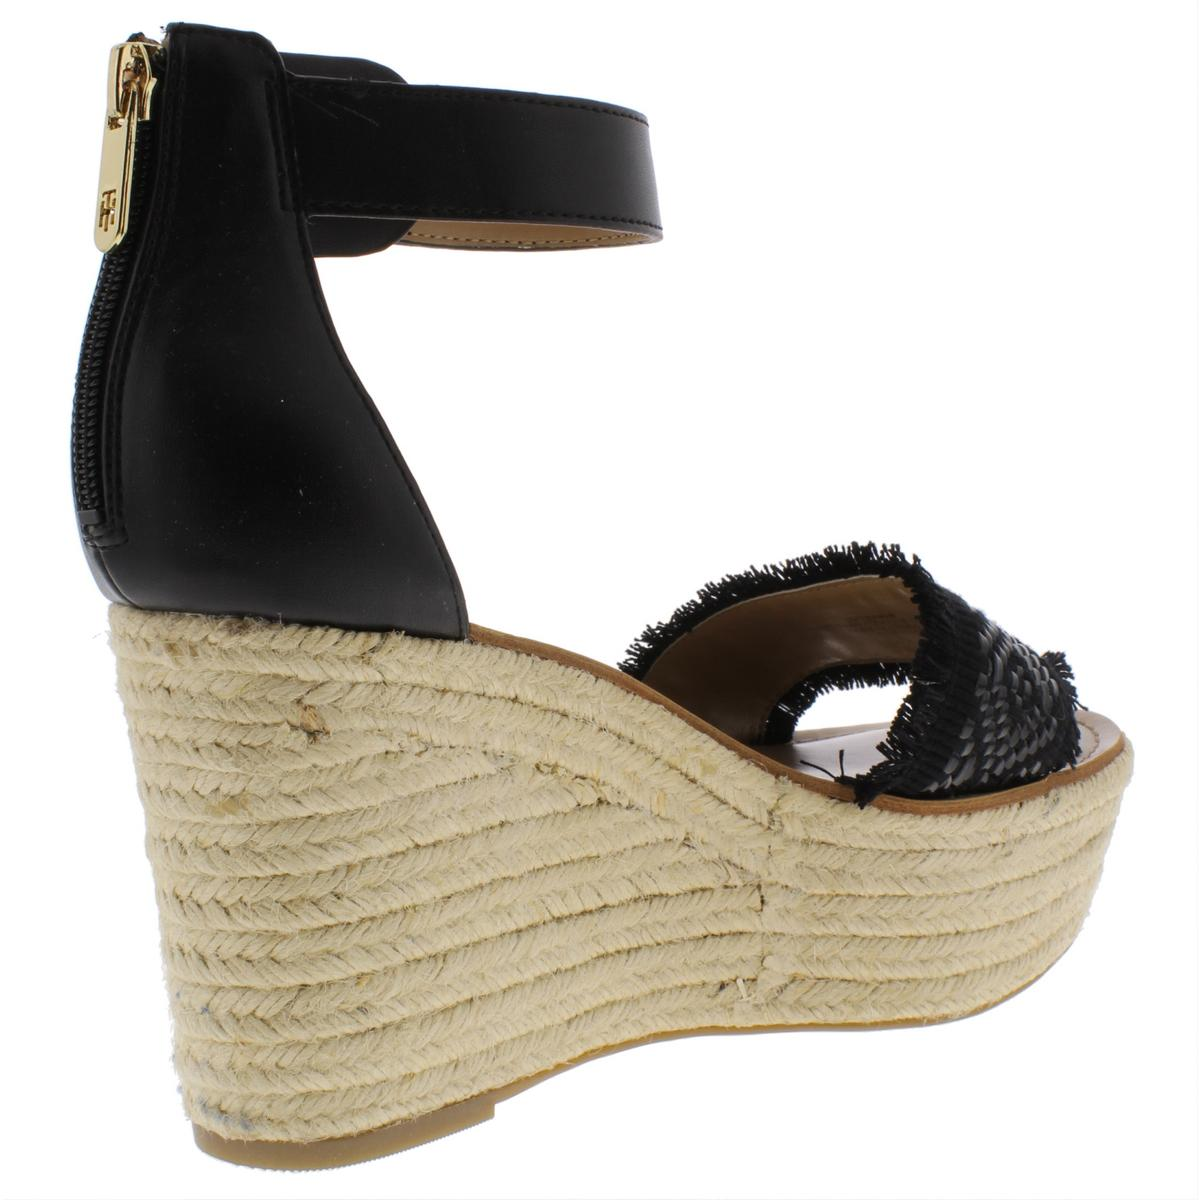 Tommy Hilfiger Womens Terrin Sandals Platform Espadrilles Wedges BHFO 7489